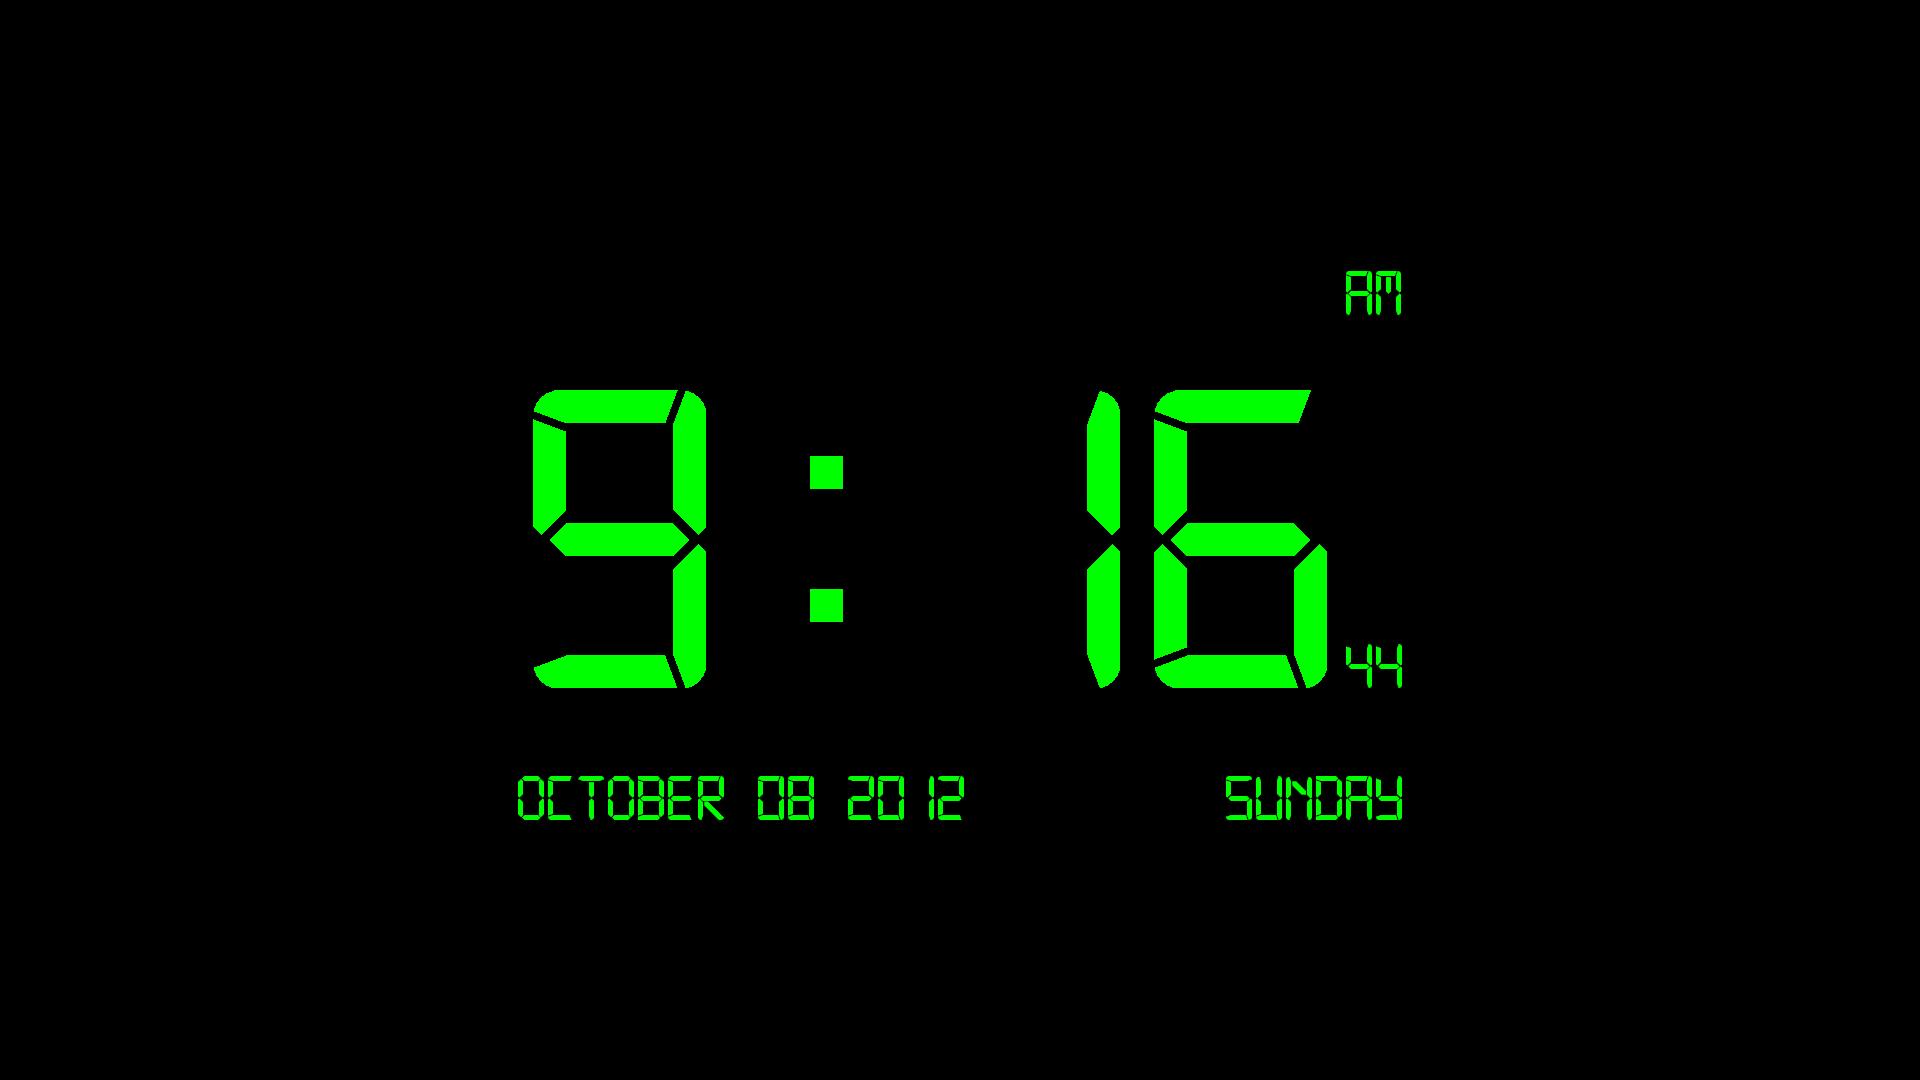 definition wallpapercomphotodigital clock desktop wallpaper7html 1920x1080